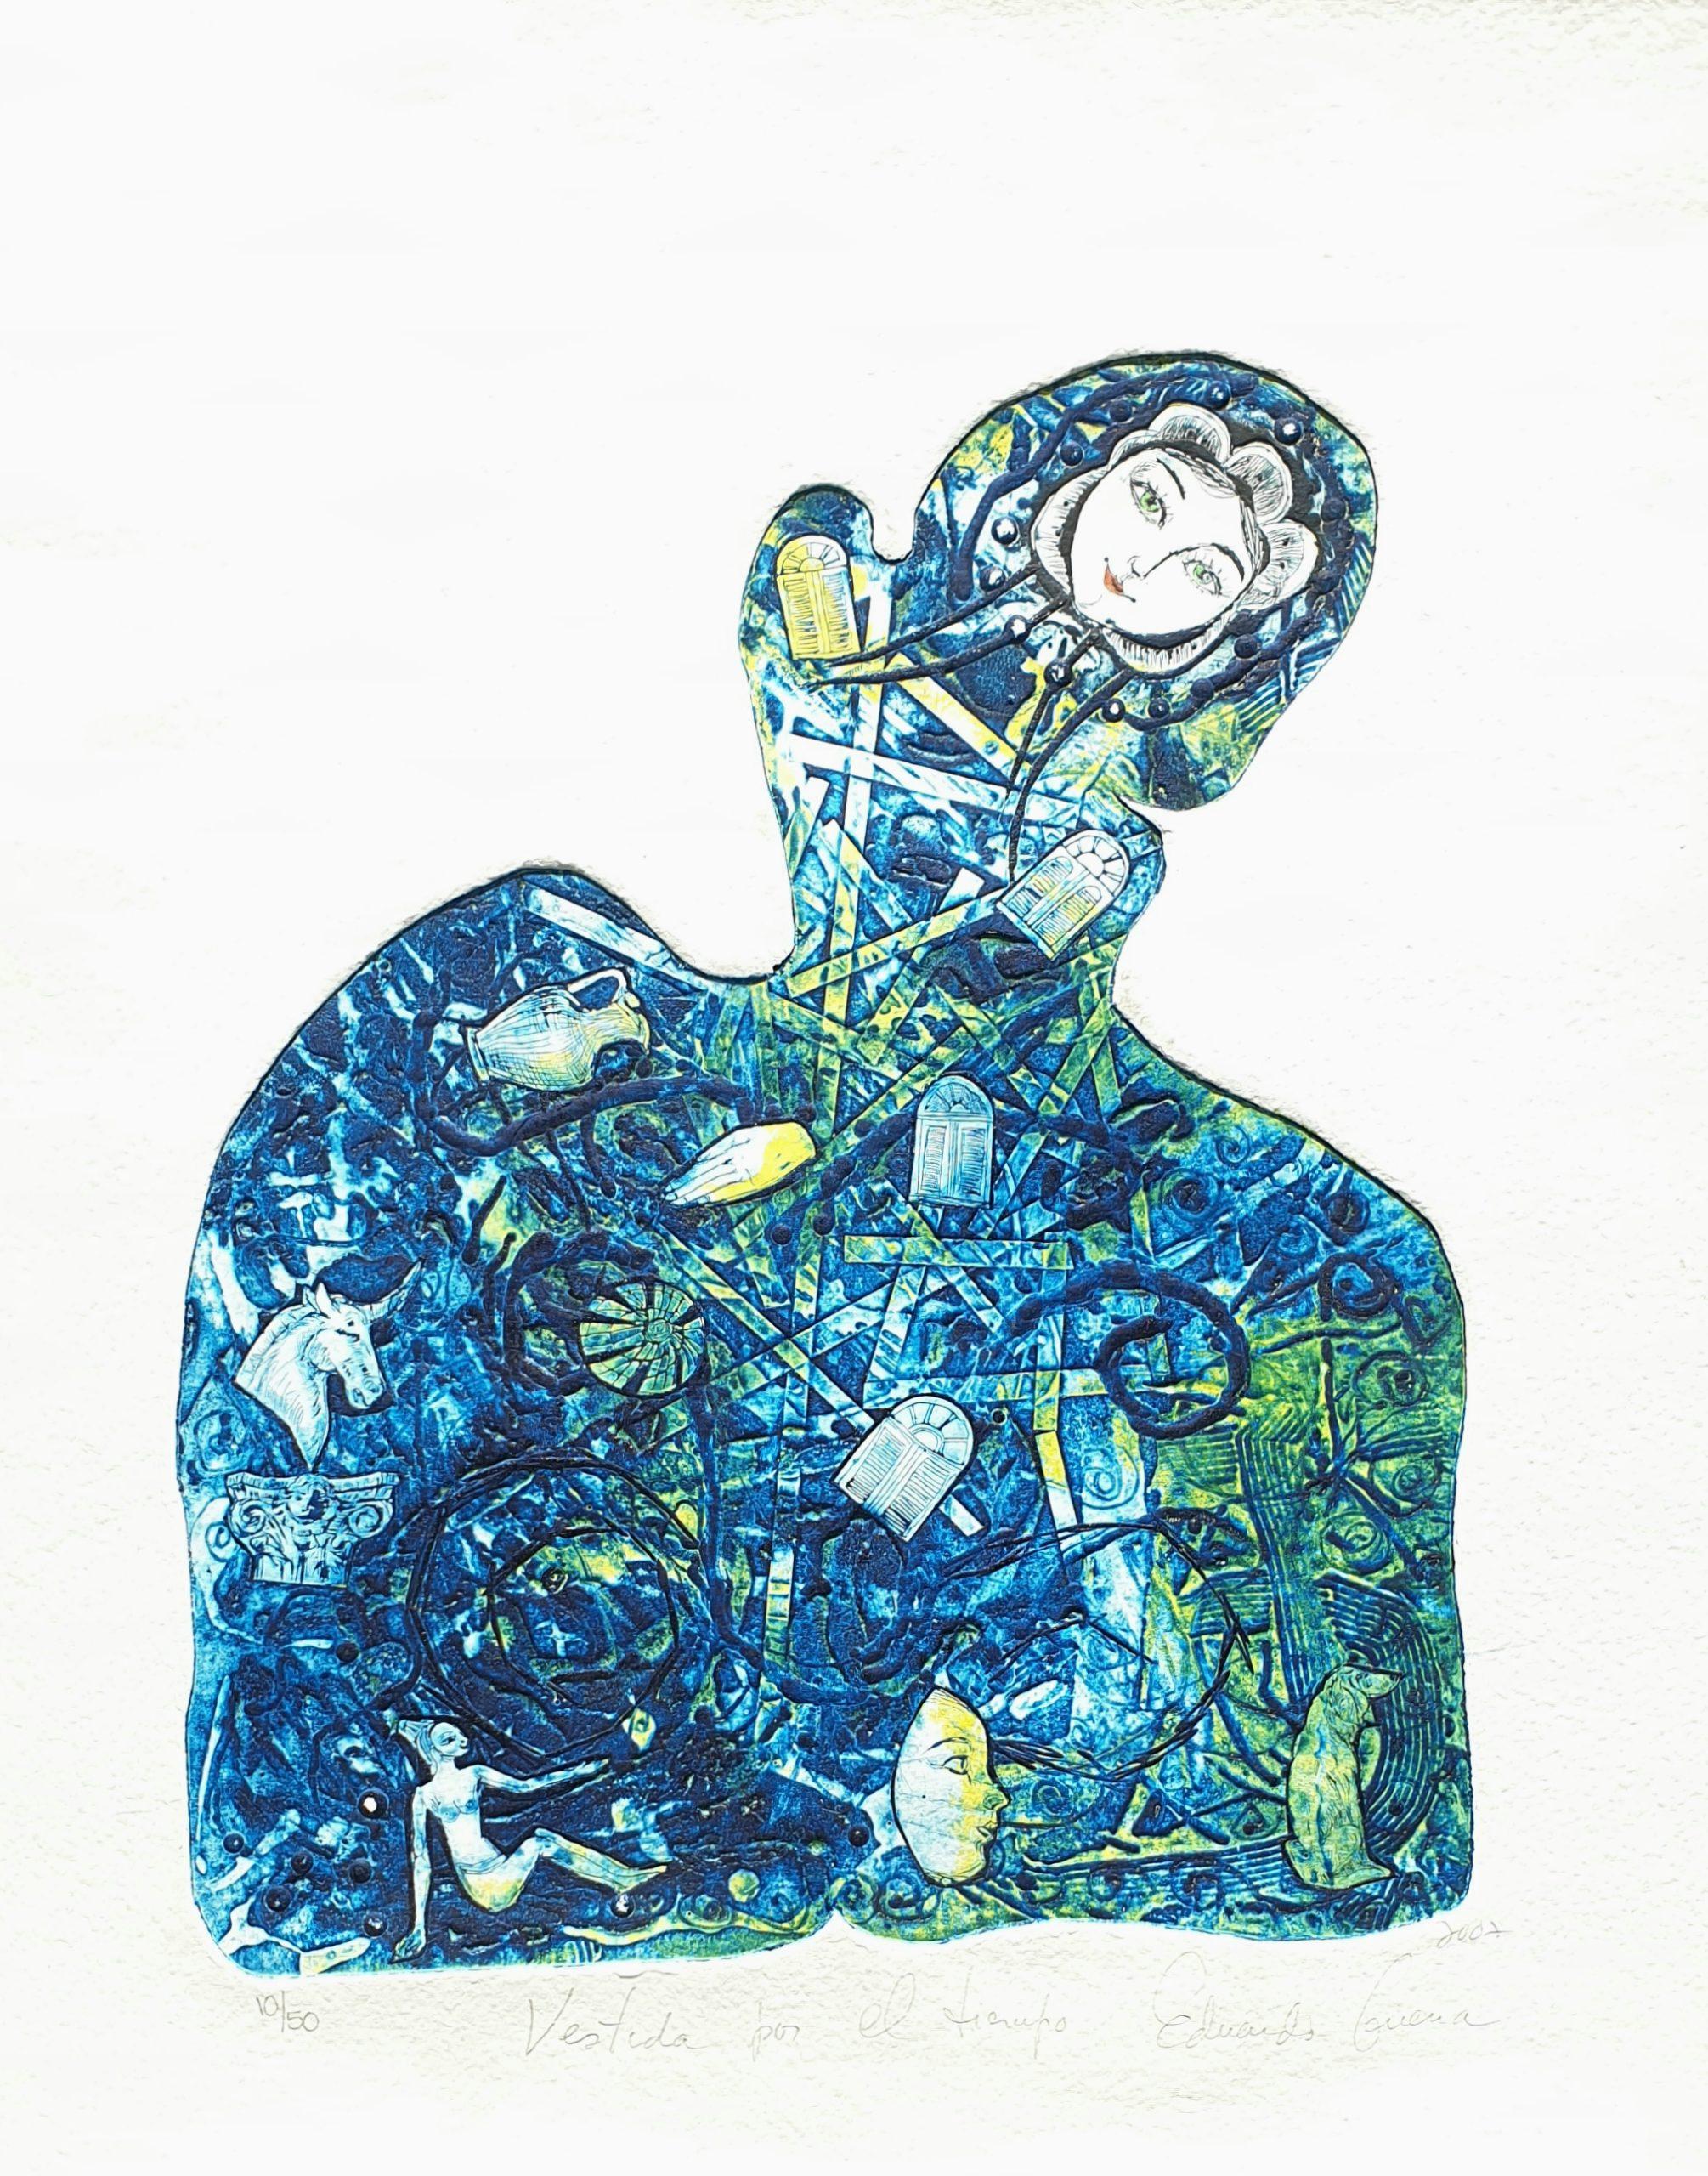 eduardo guerra ets etching cuba fine art pinar del rio cuban art los once kunst graphic art online galley art online cuban fine art lijstenmaker heerenveen lijstenmakerij kunsthandel falkenaweg friesland skoander bisit skoander.com kunst